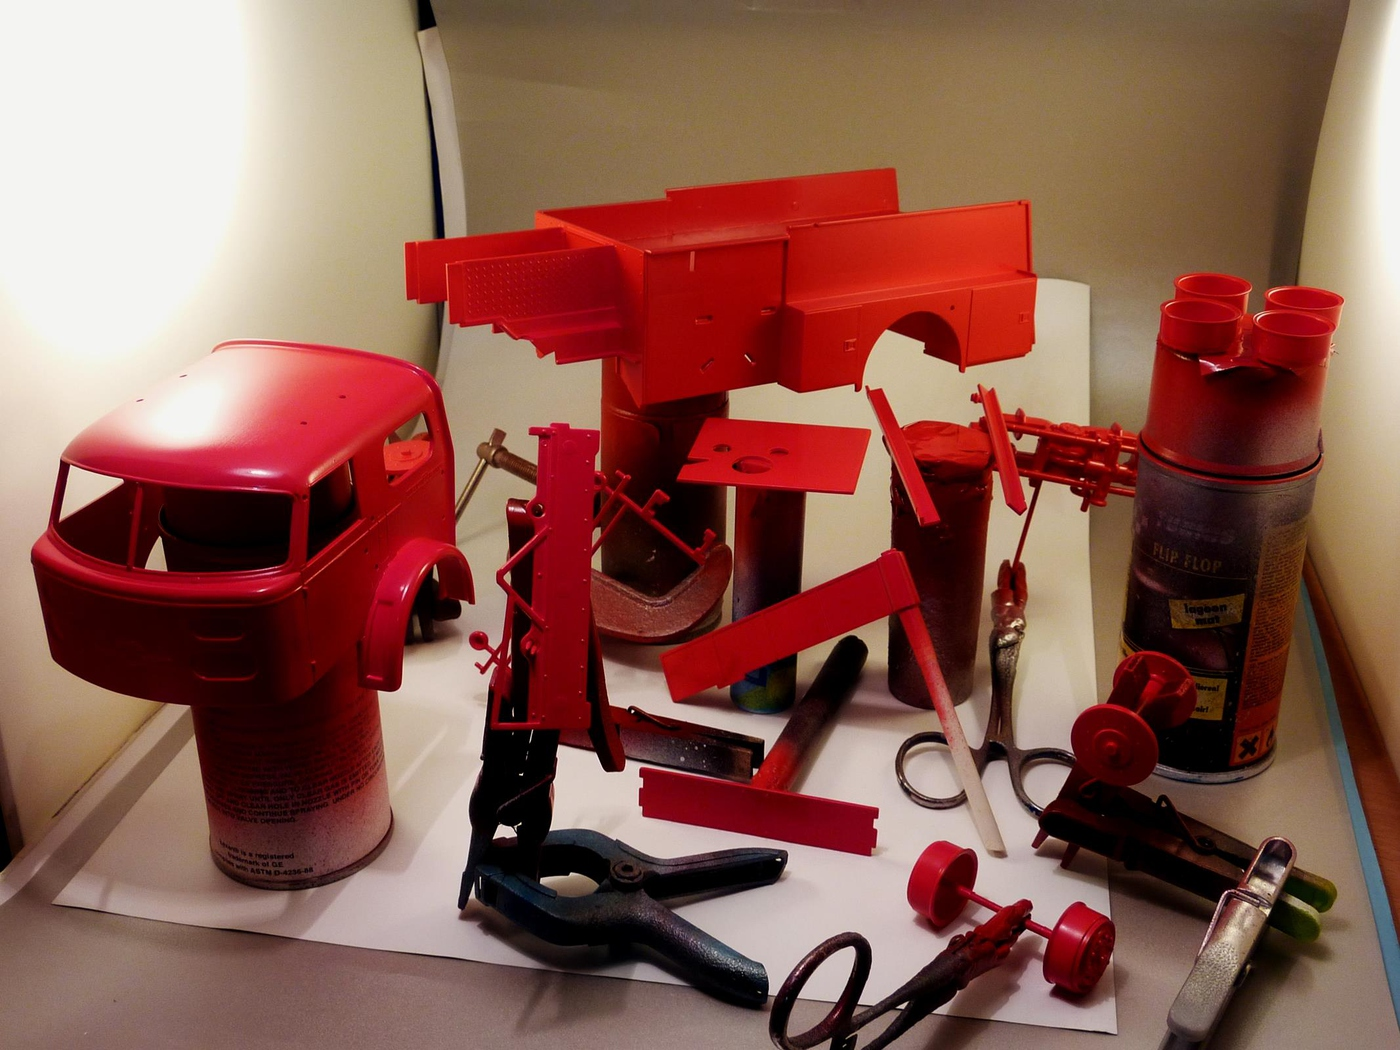 American Lafrance pumper terminé Photo-vi